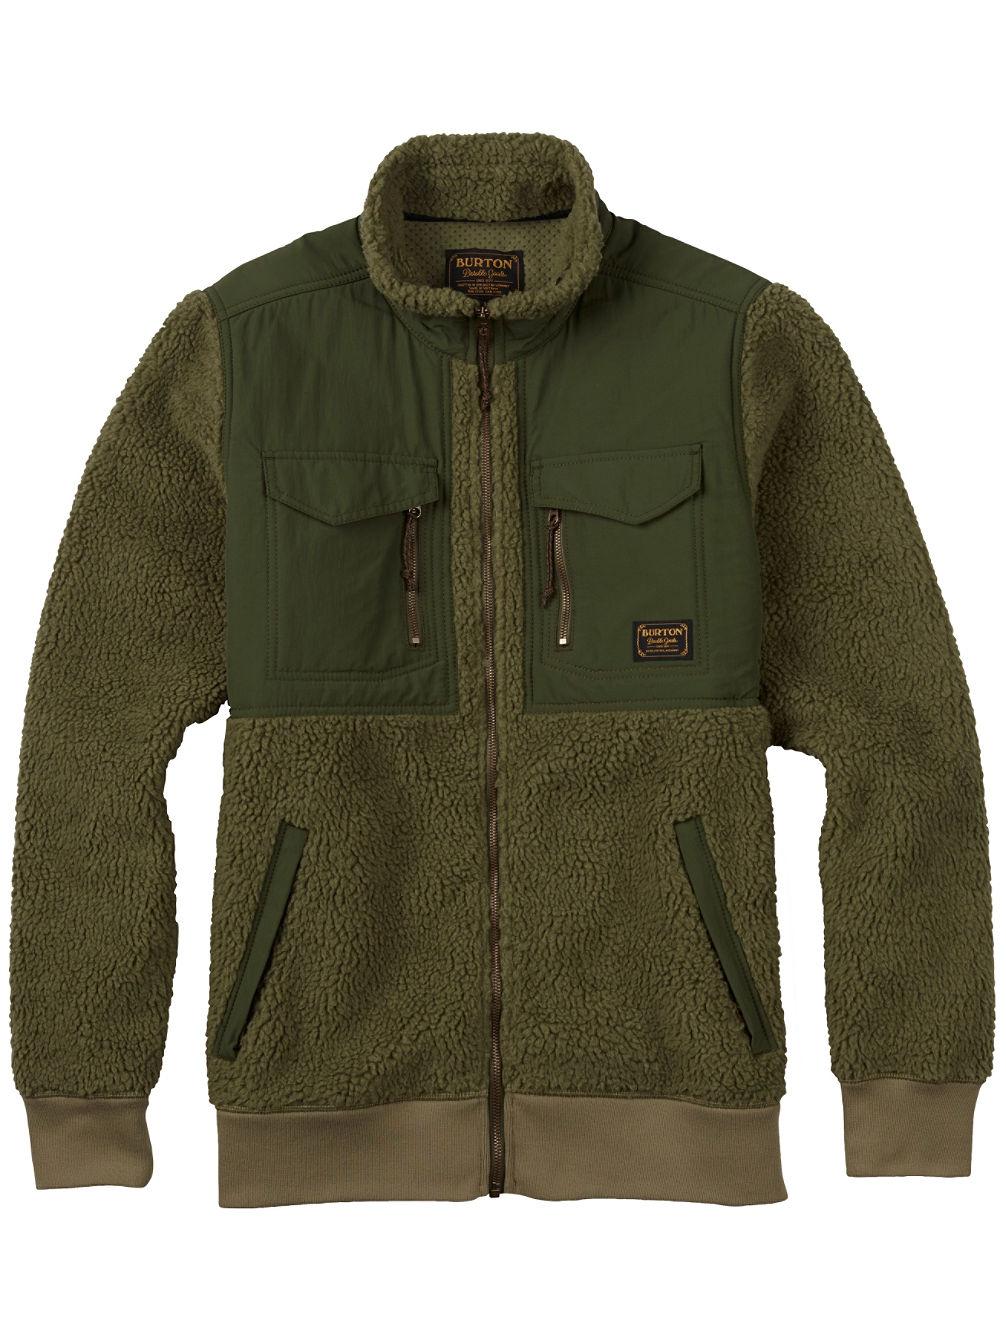 bower-fleece-jacket